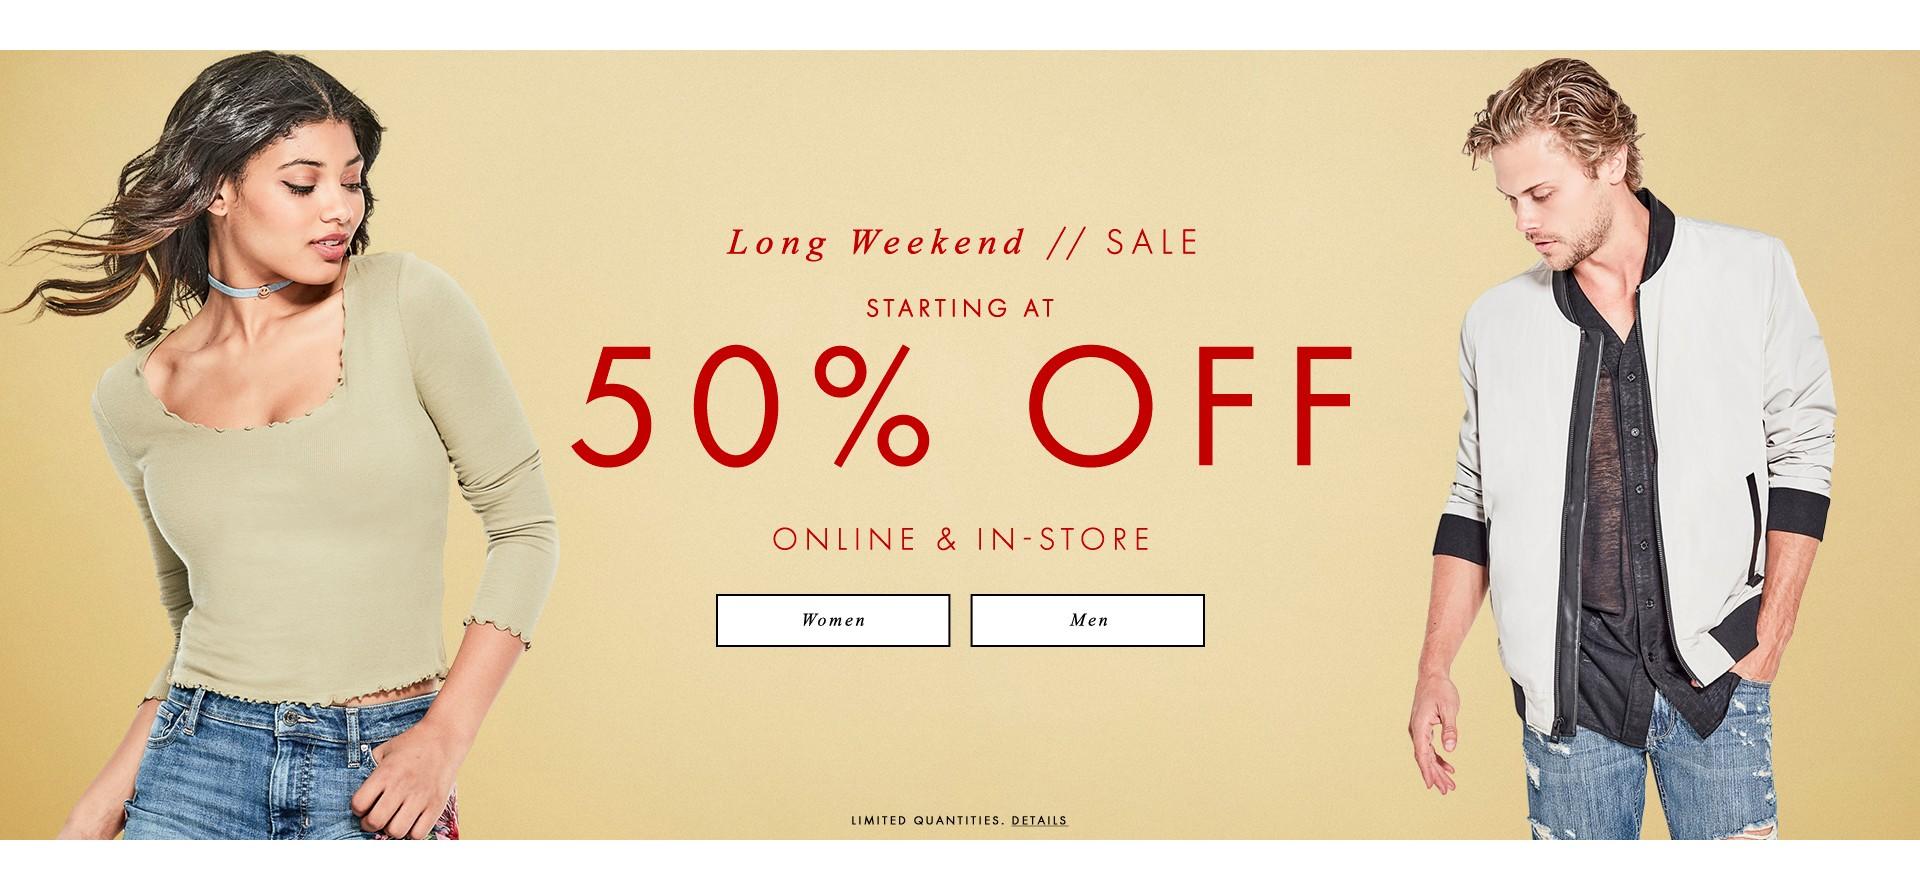 long weekend sale starting 50% off